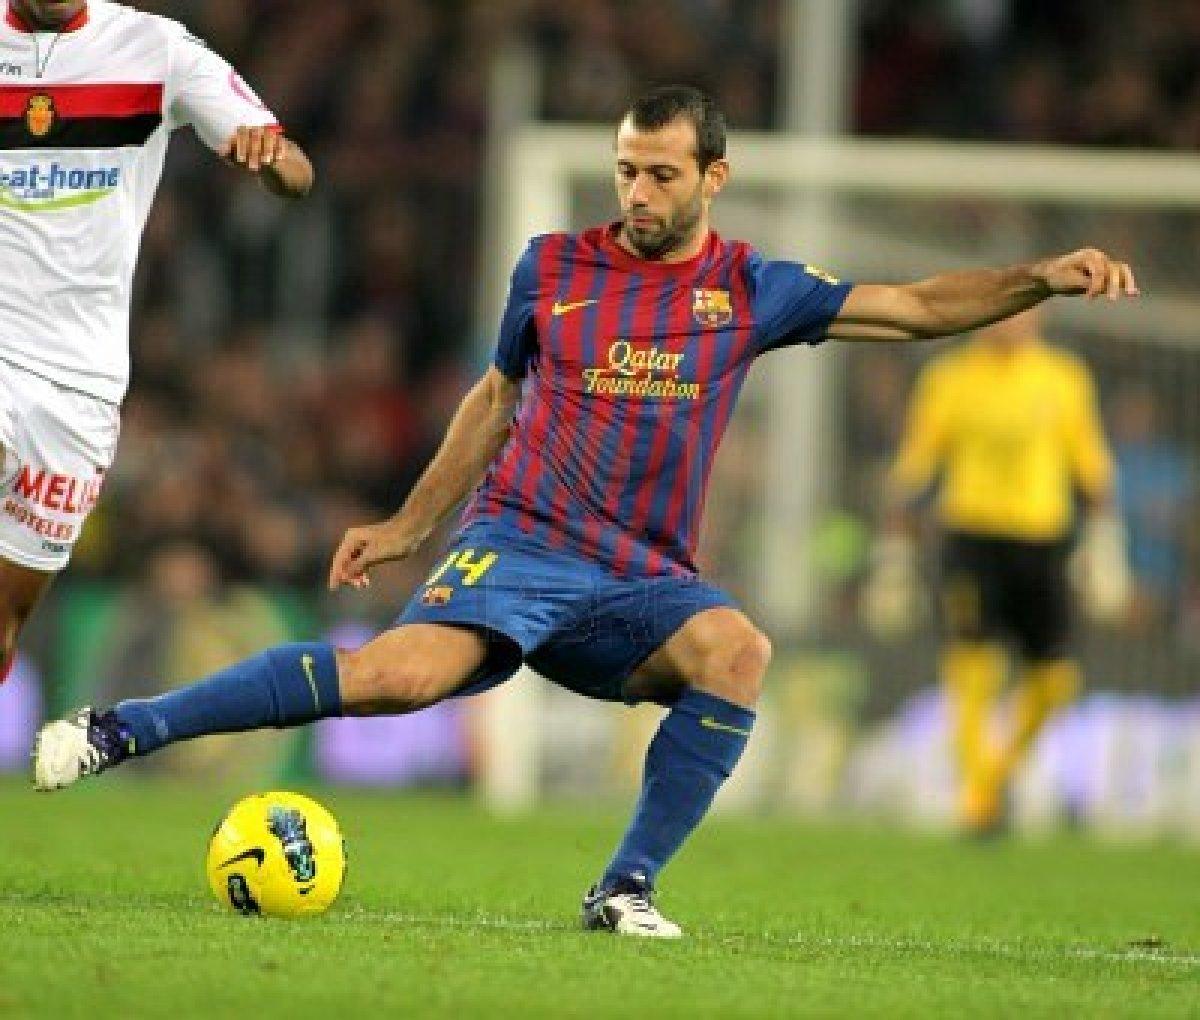 http://3.bp.blogspot.com/-v-Q5HY3PMTs/T-nFgEsH08I/AAAAAAAACfg/B0pl9-F9y-I/s1600/Javier+Mascherano_2.jpg